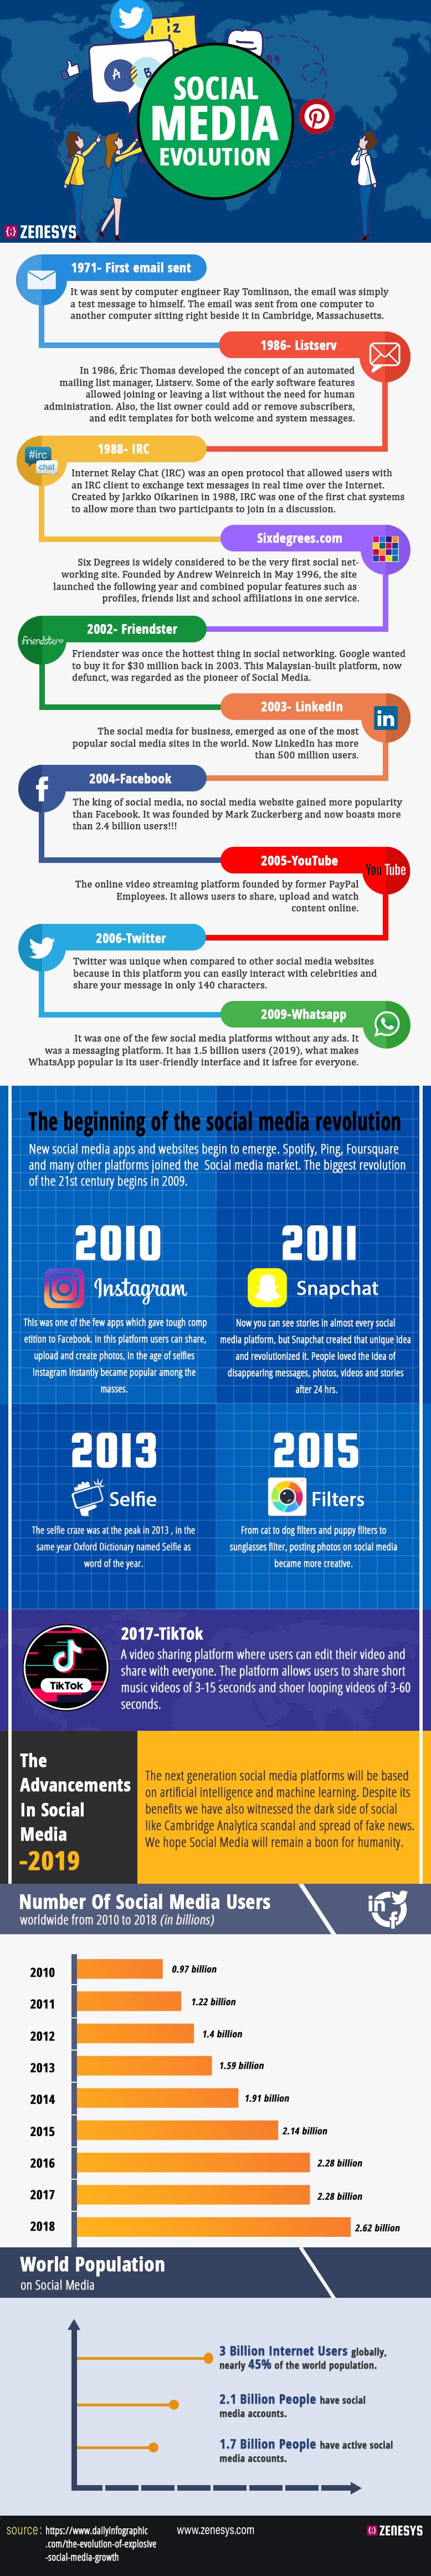 Social Media Evolution #infographic